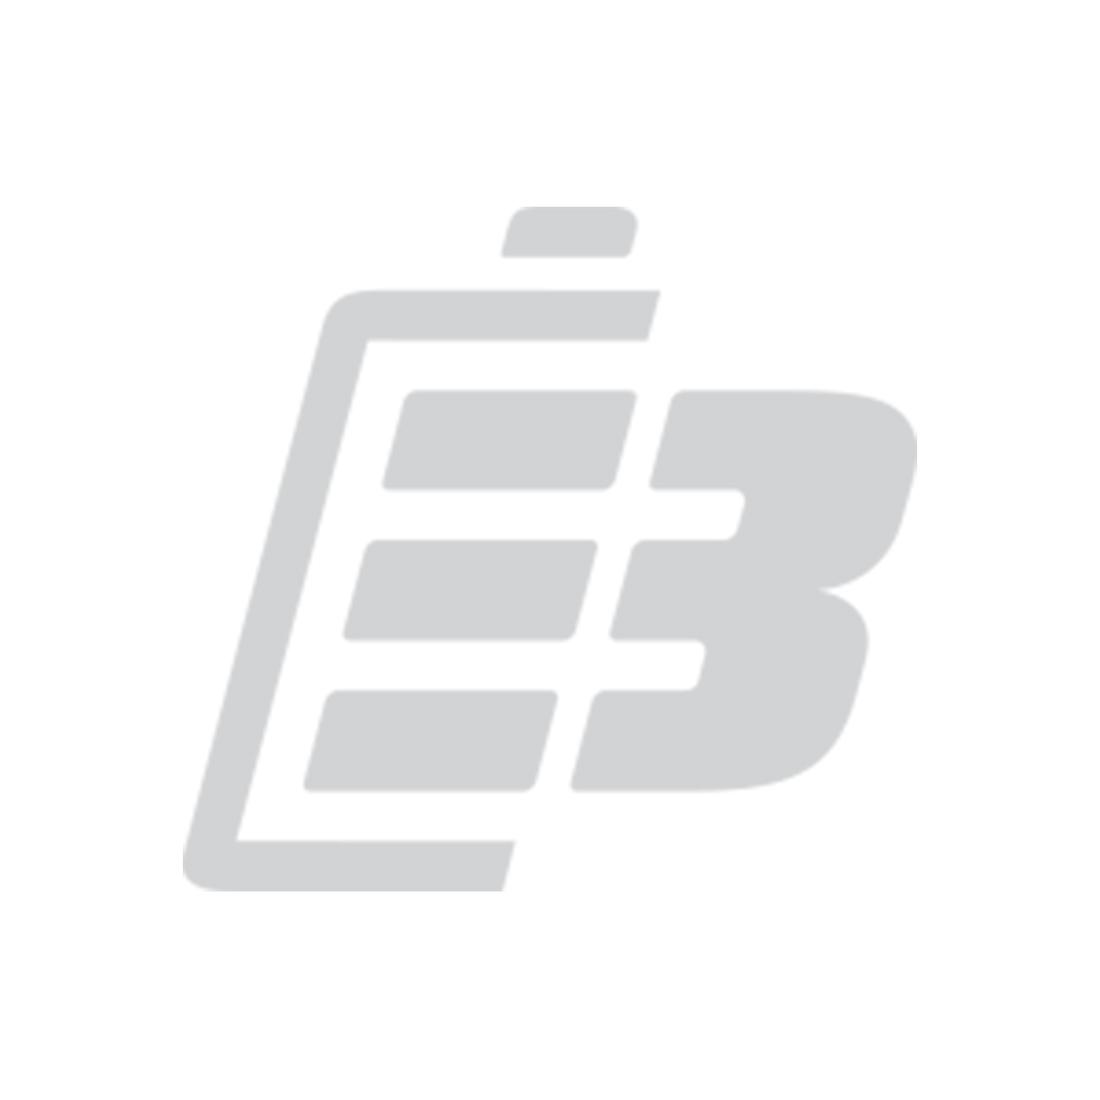 379 Energizer button Battery 1